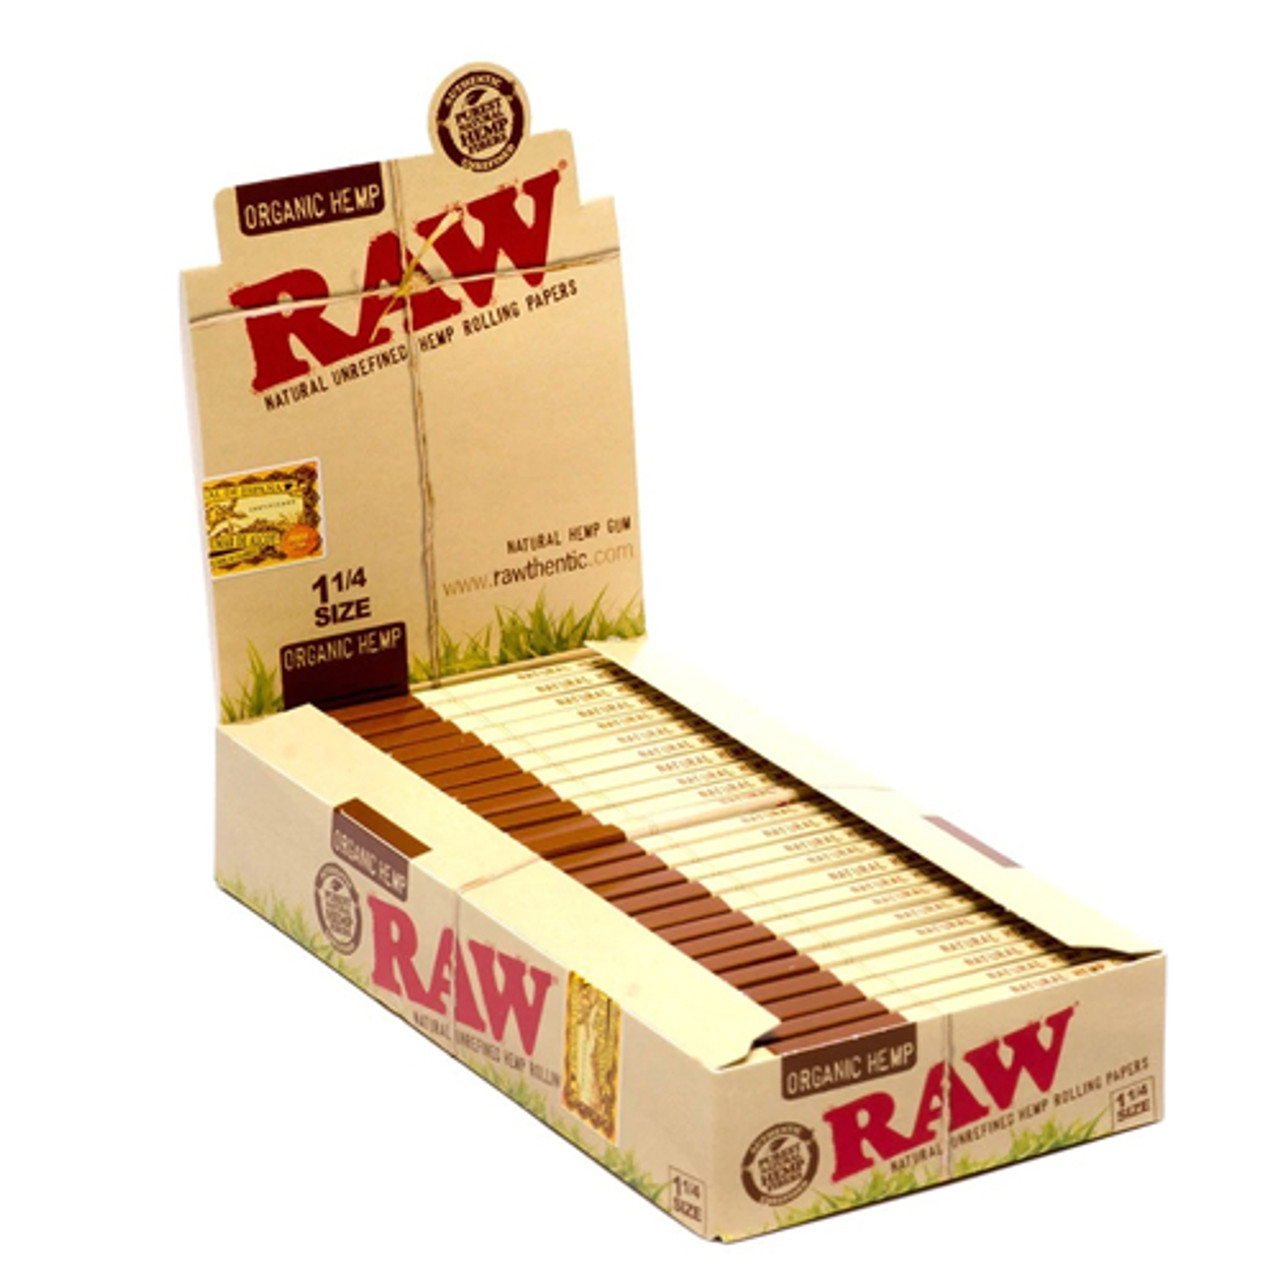 Raw Organic Hemp Rolling Papers 1 1/4 (Display of 24)